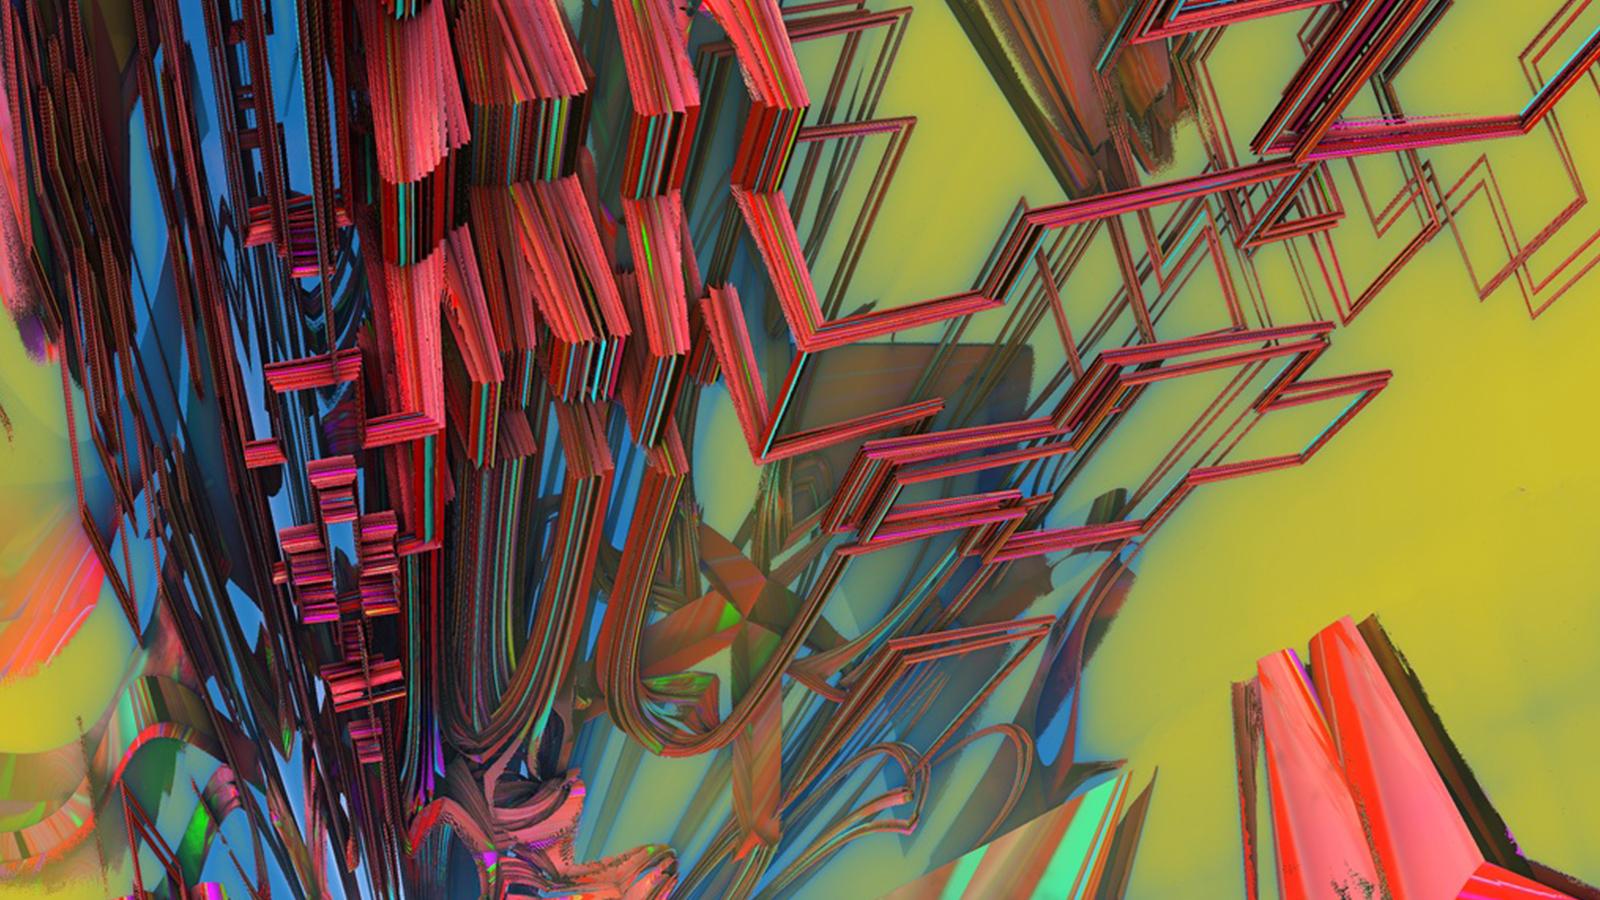 The digitalism doctrine